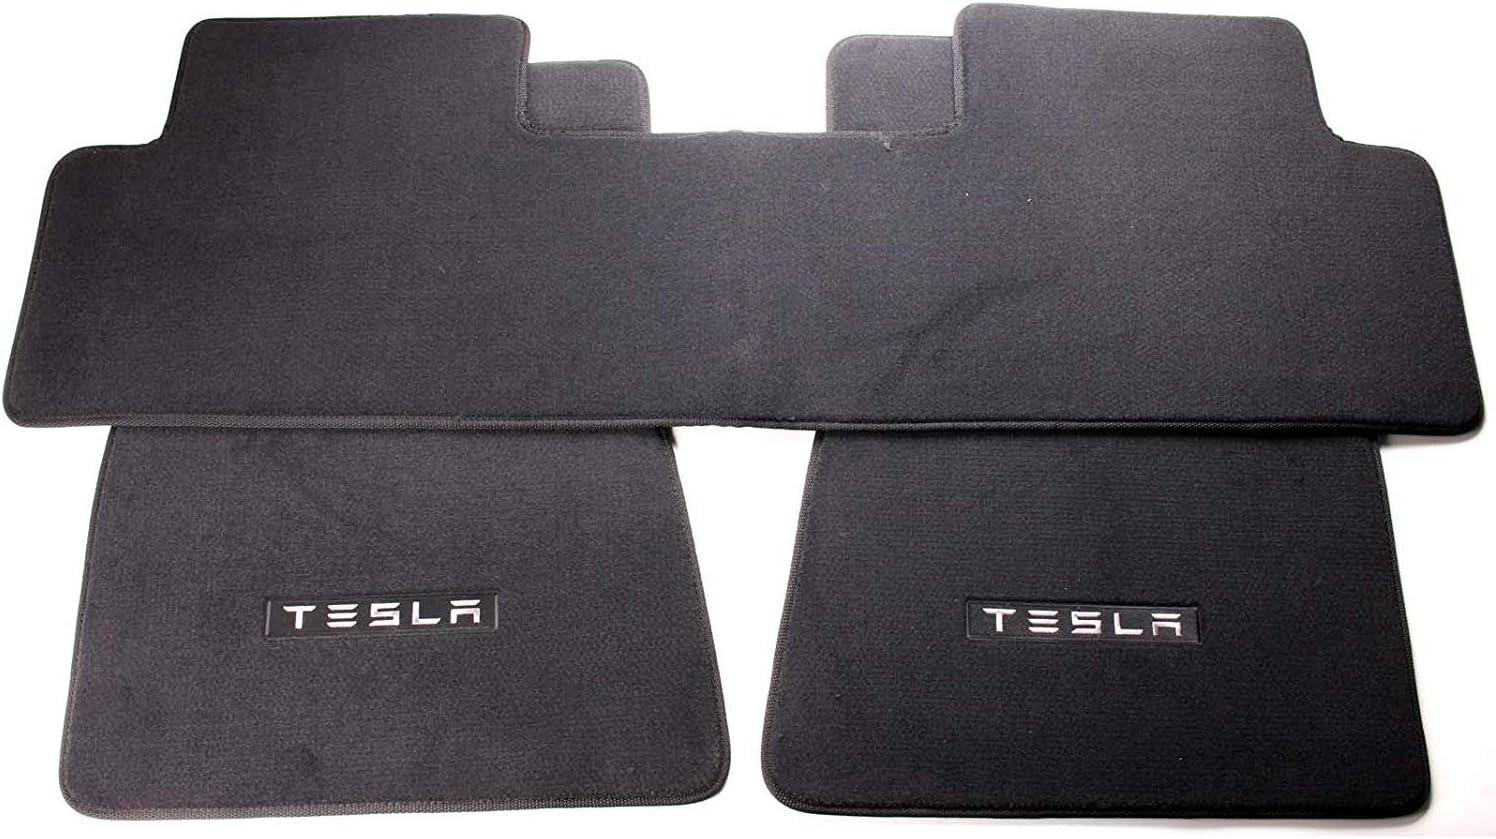 Premium 3-Piece Floor Mats for Tesla Model 3 with Heavy Duty Black Plush Quality Carpet